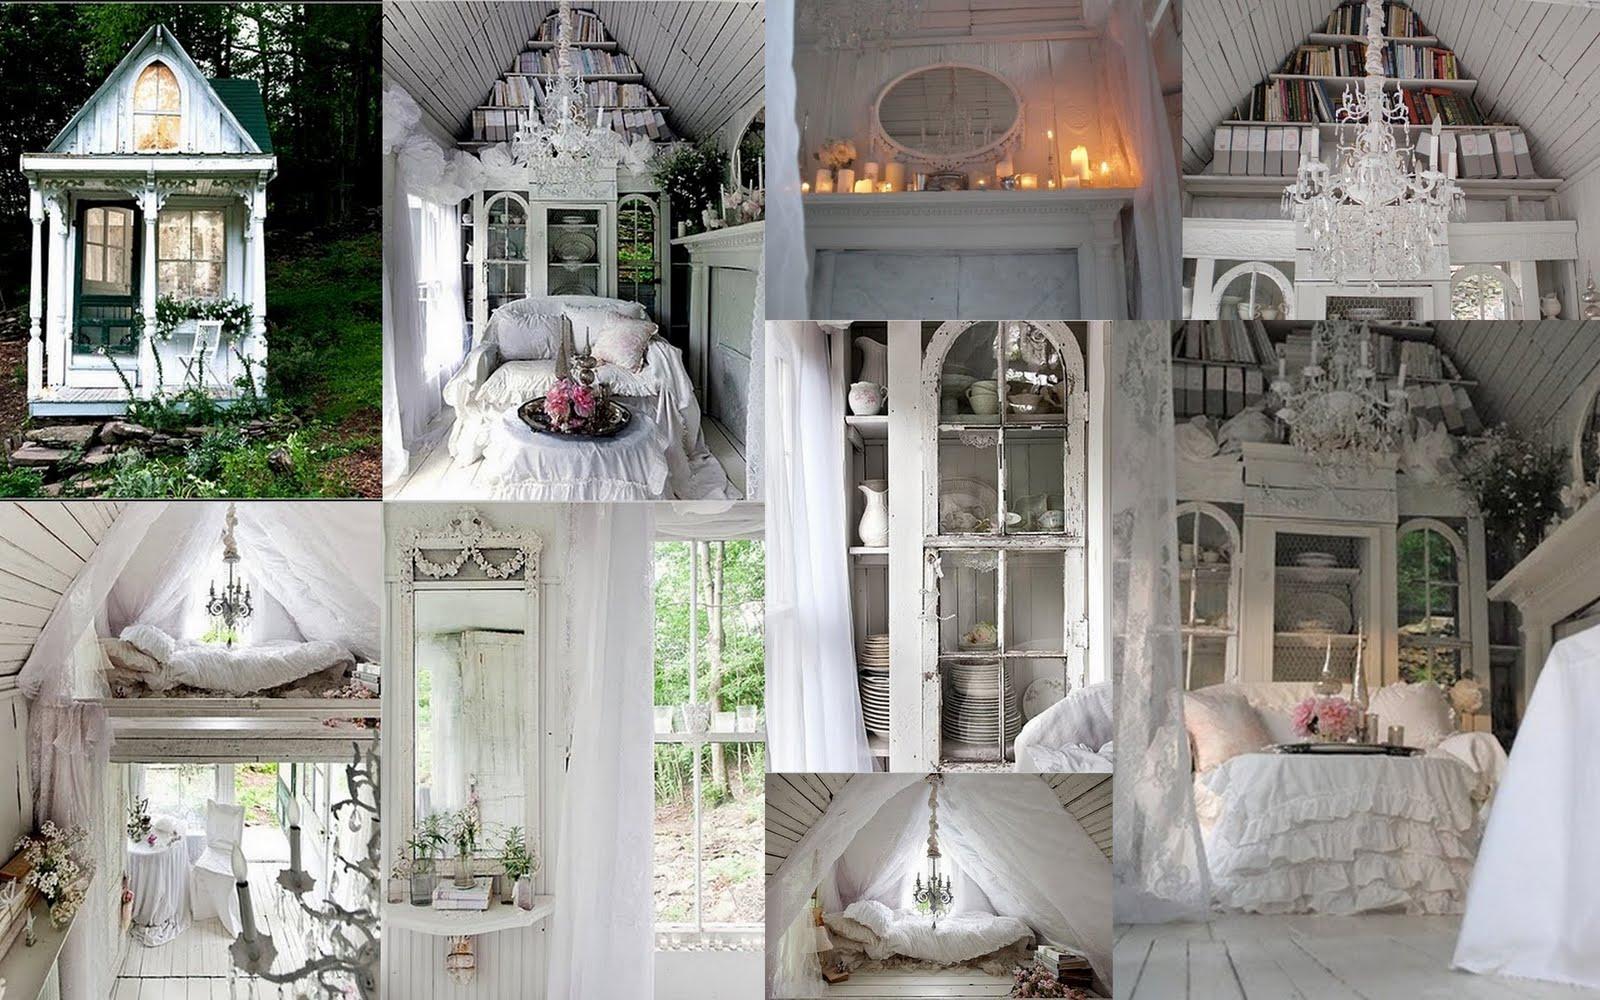 Casa mia little shabby chic cottage - Casas shabby chic ...